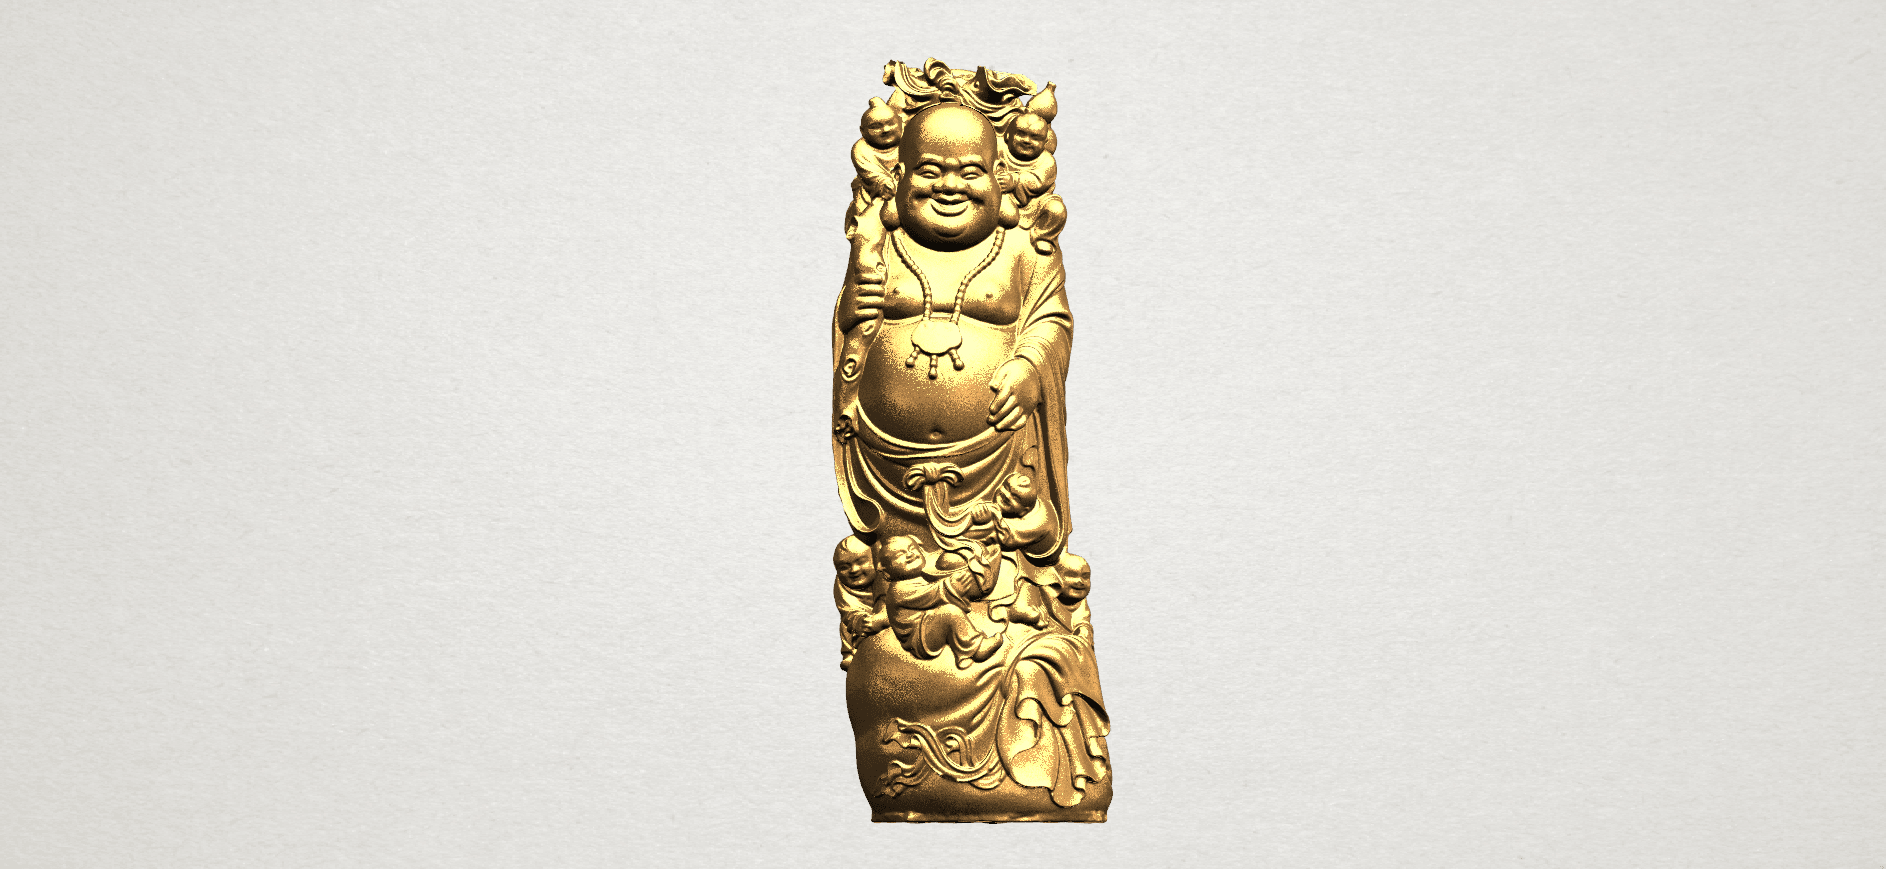 TDA0070 Metteyya Buddha 02 - 88mm - A01.png Download free STL file Metteyya Buddha 02 • 3D printer object, GeorgesNikkei